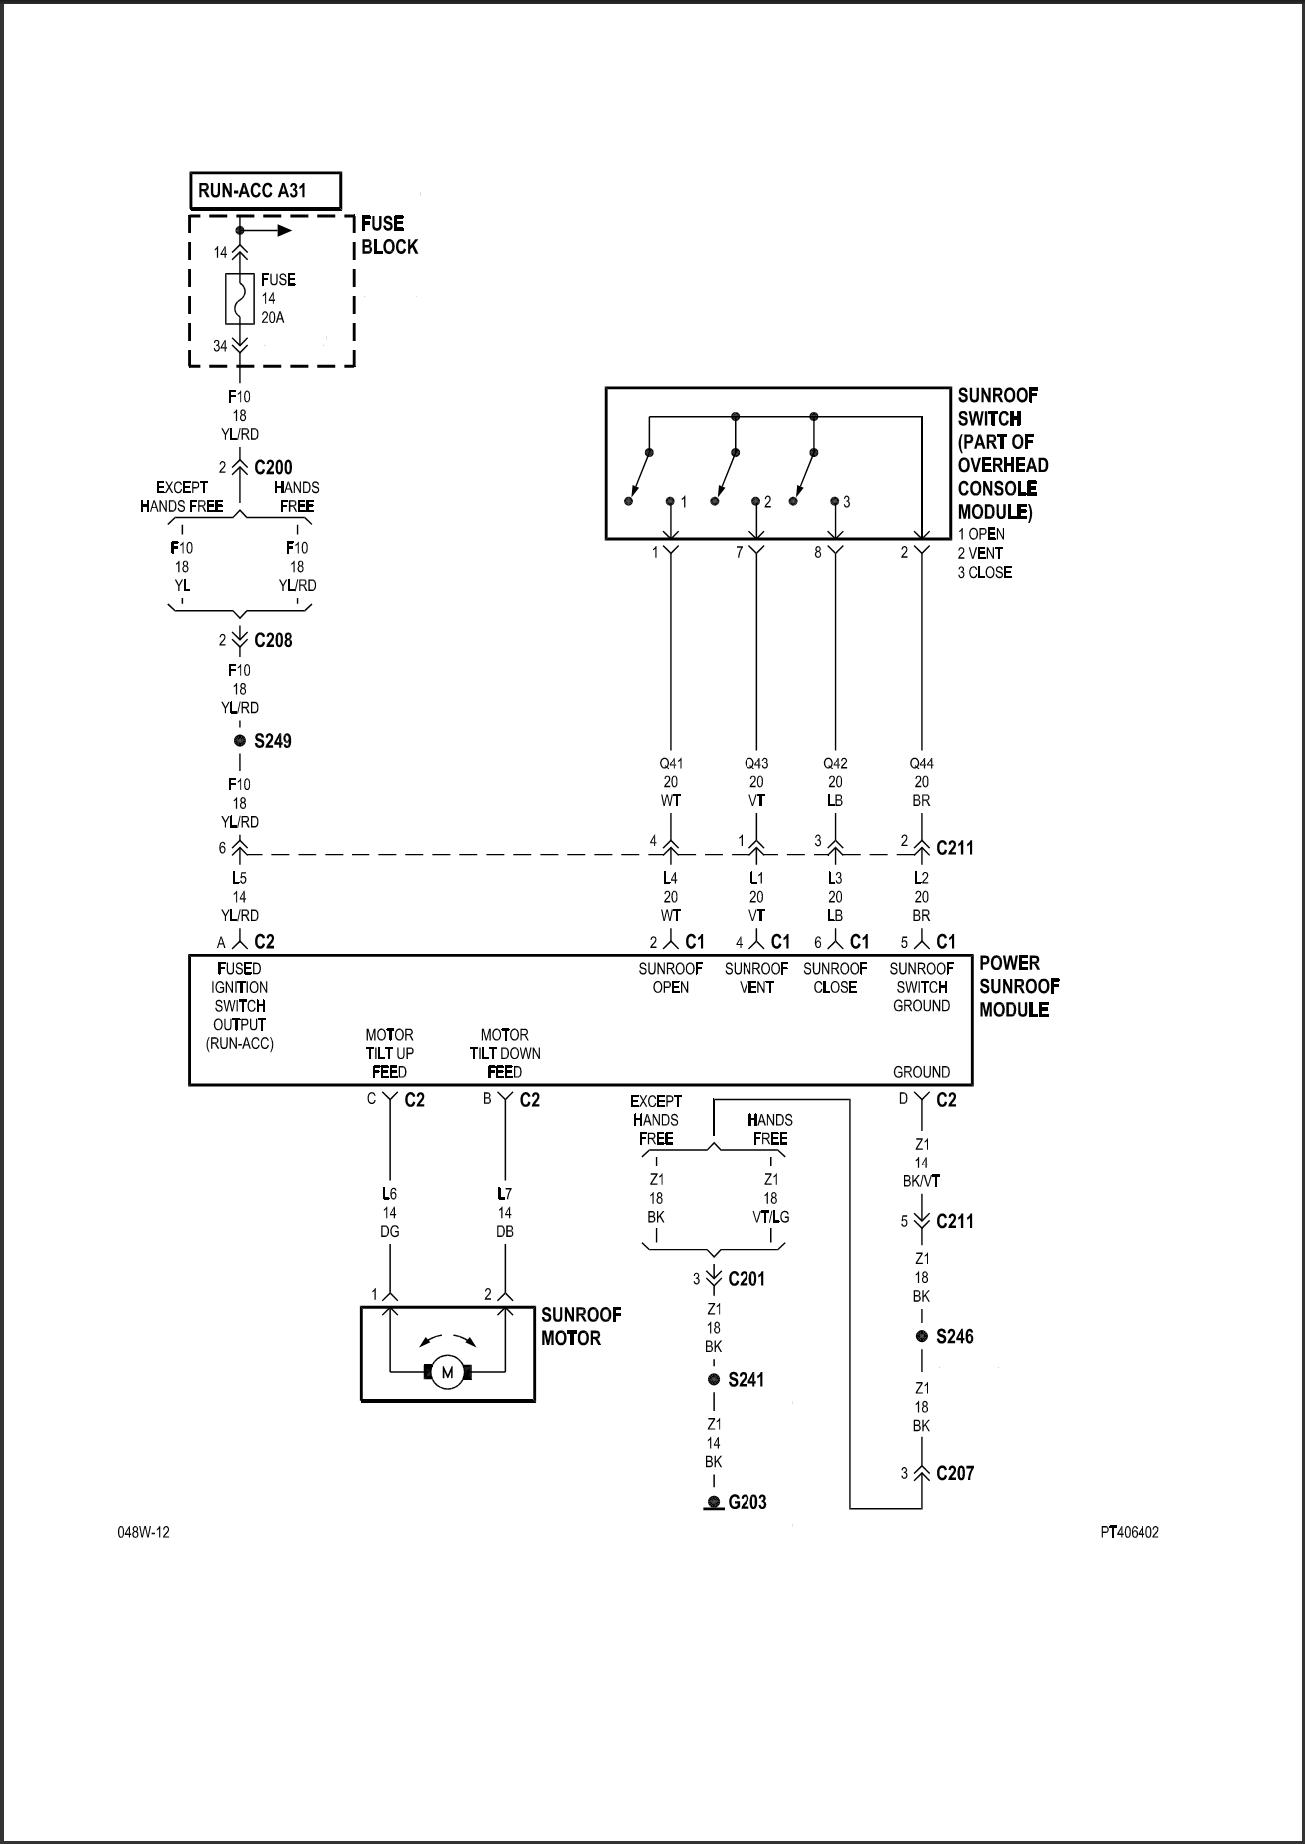 Ba3 Wiring Diagram 2003 Pt Cruiser Wiring Library